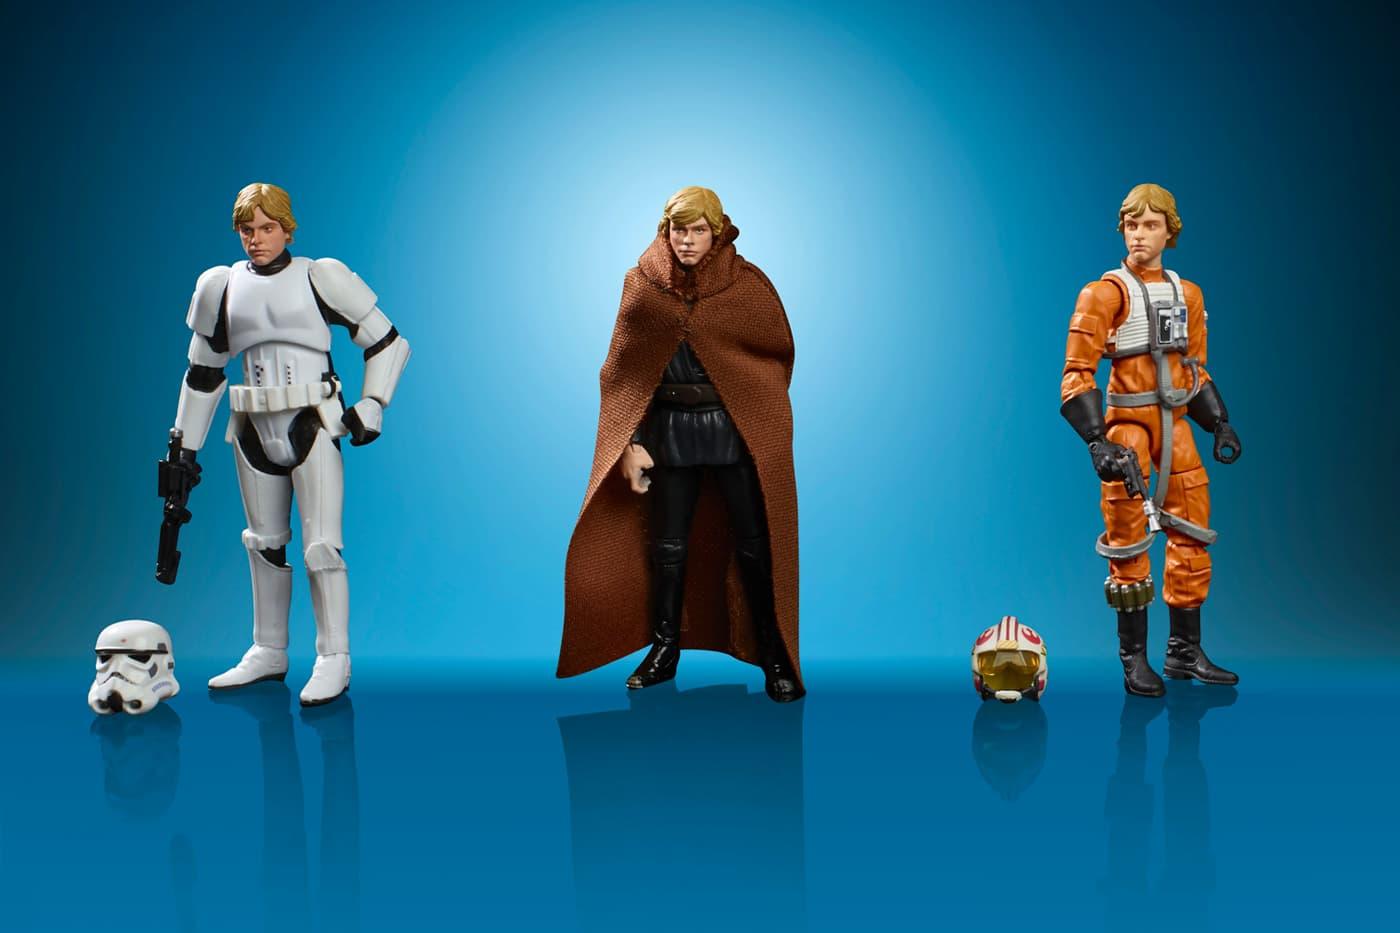 Hasbro is Bringing Back its Retro 'Star Wars' Figurines